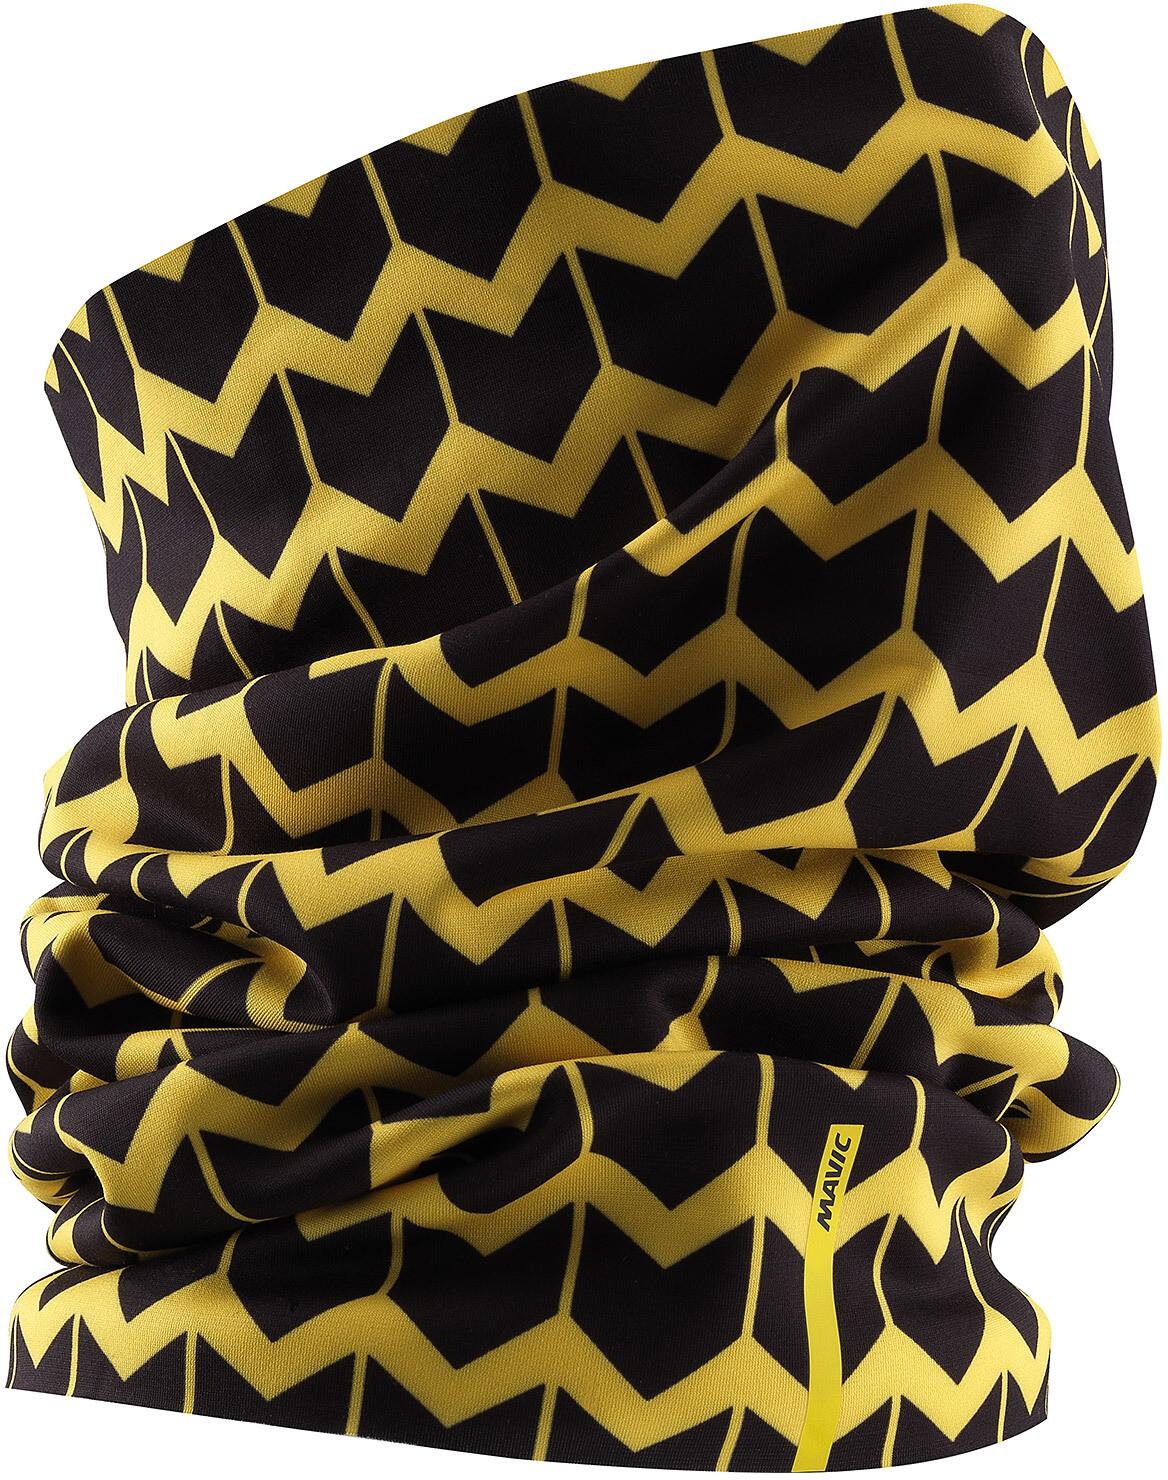 Mavic Cosmic Halskrave, yellow mavic/black (2019) | Hovedbeklædning